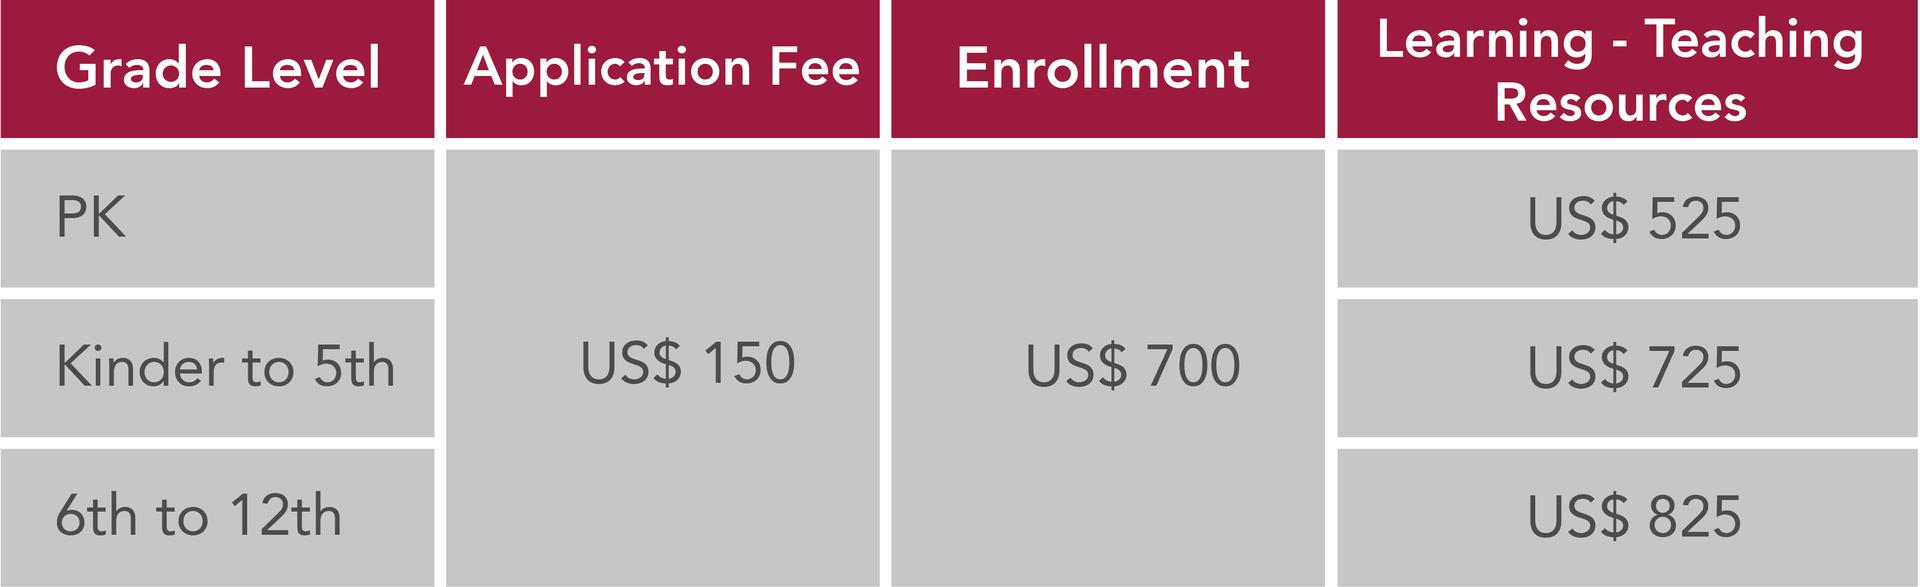 Boston School International, Panama, Option 2 payment Without Capital Fee